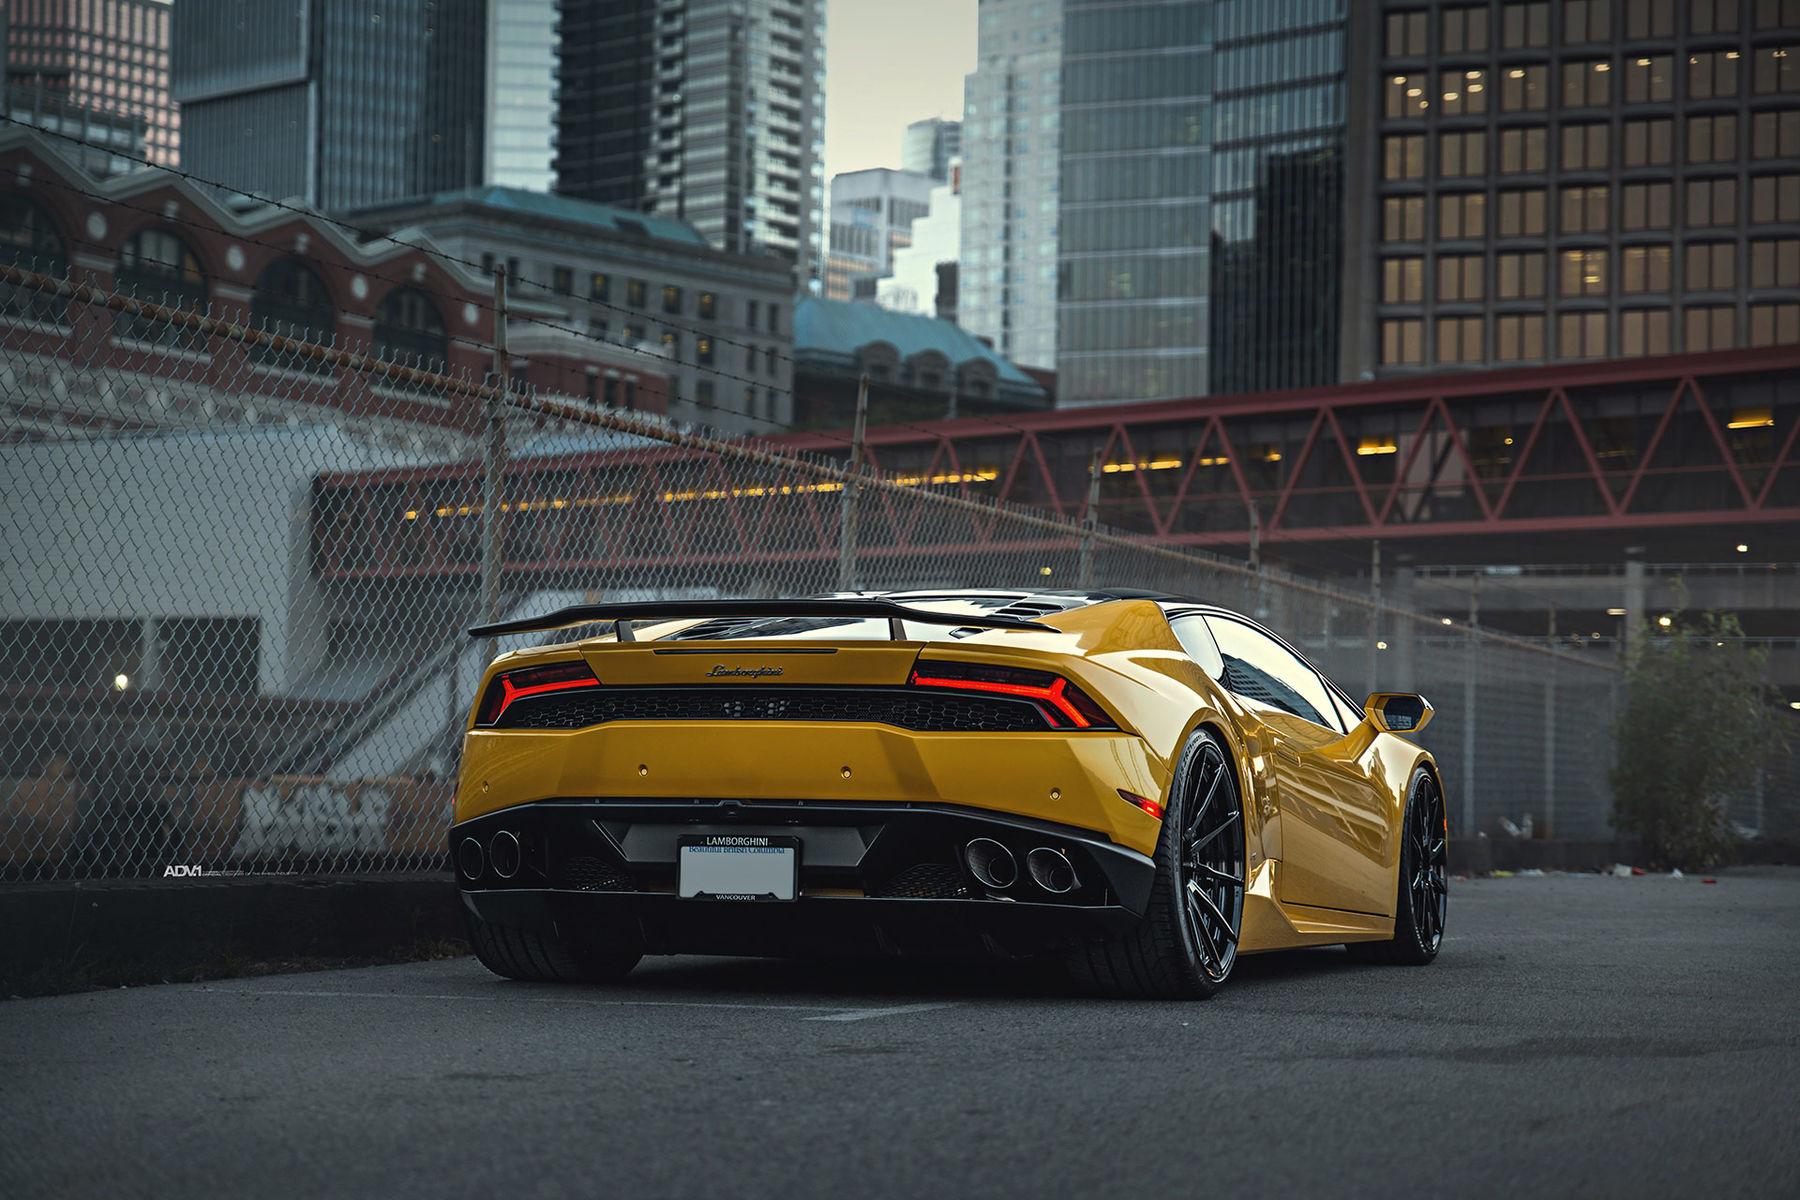 Lamborghini Huracan | Yellow Lamborghini Huracan LP610-4 - ADV.1 ADV10 M.V2 CS Series Gloss Black Wheels